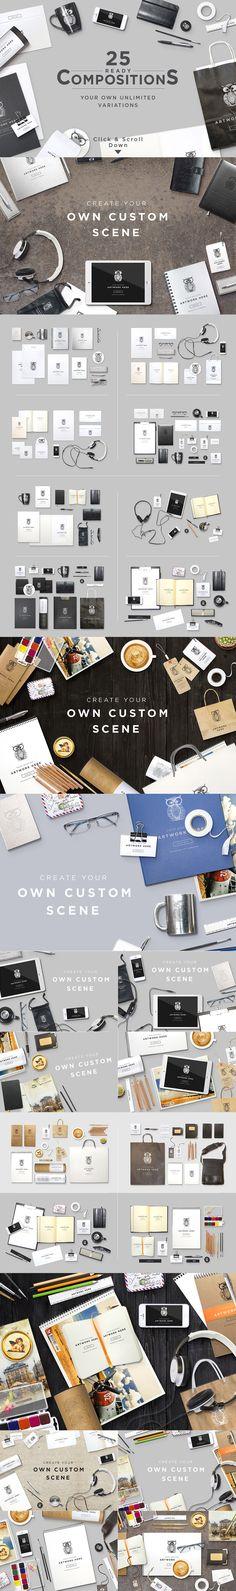 Header Stationery Scene Generator by itembridge creative store on Creative Market